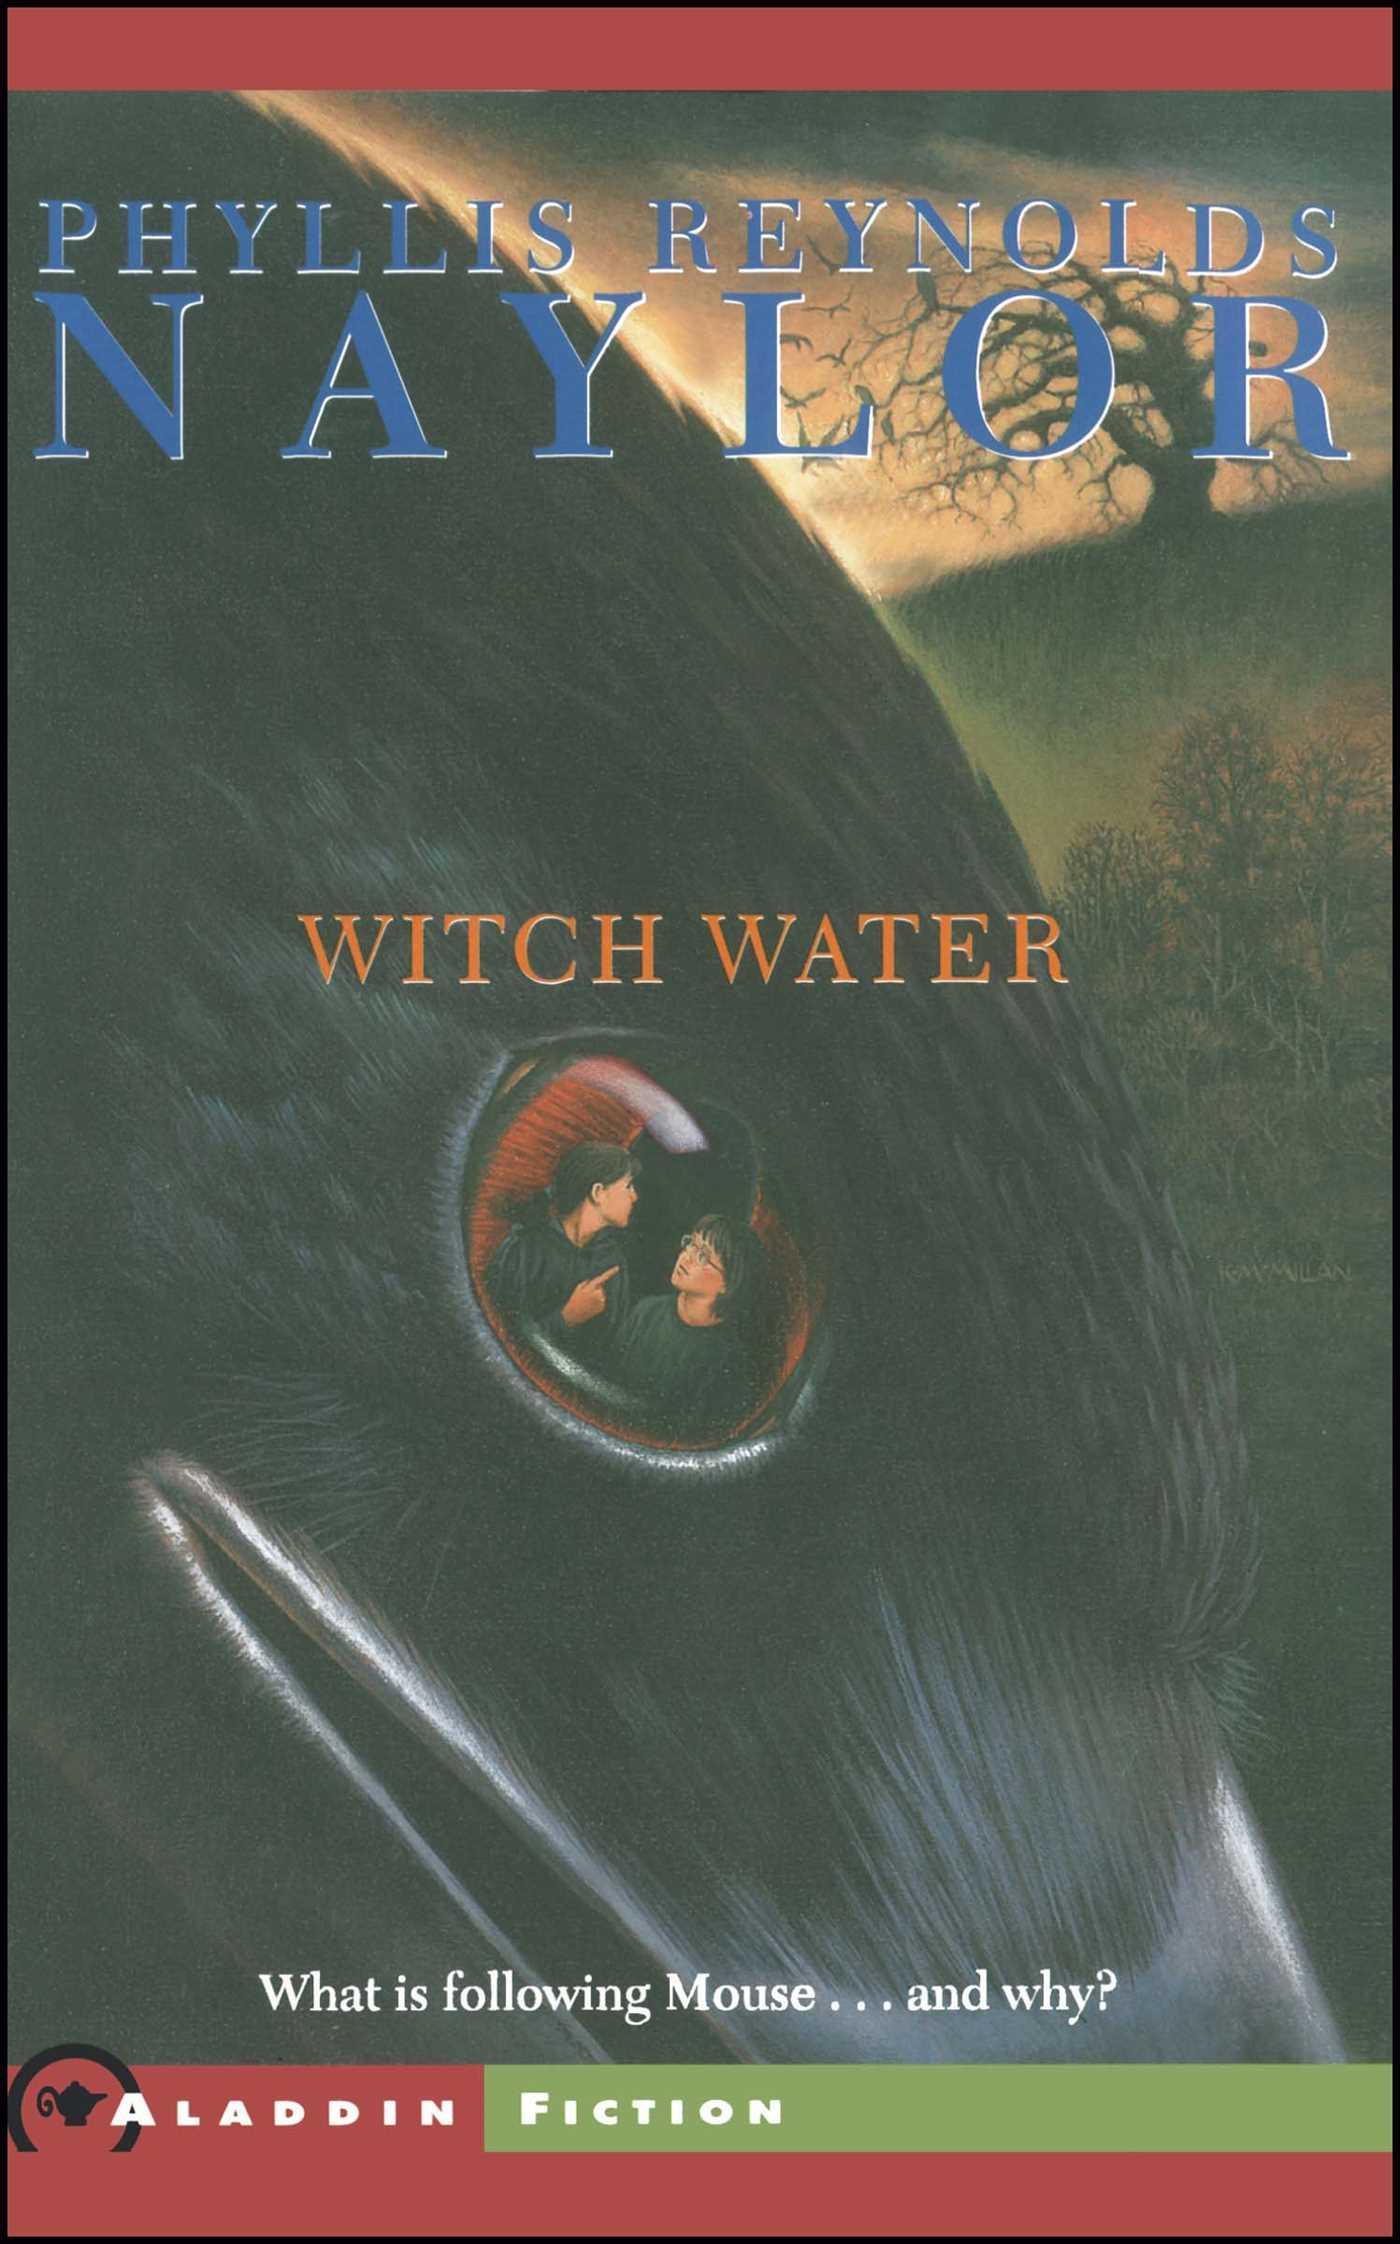 Witch water 9780689853166 hr